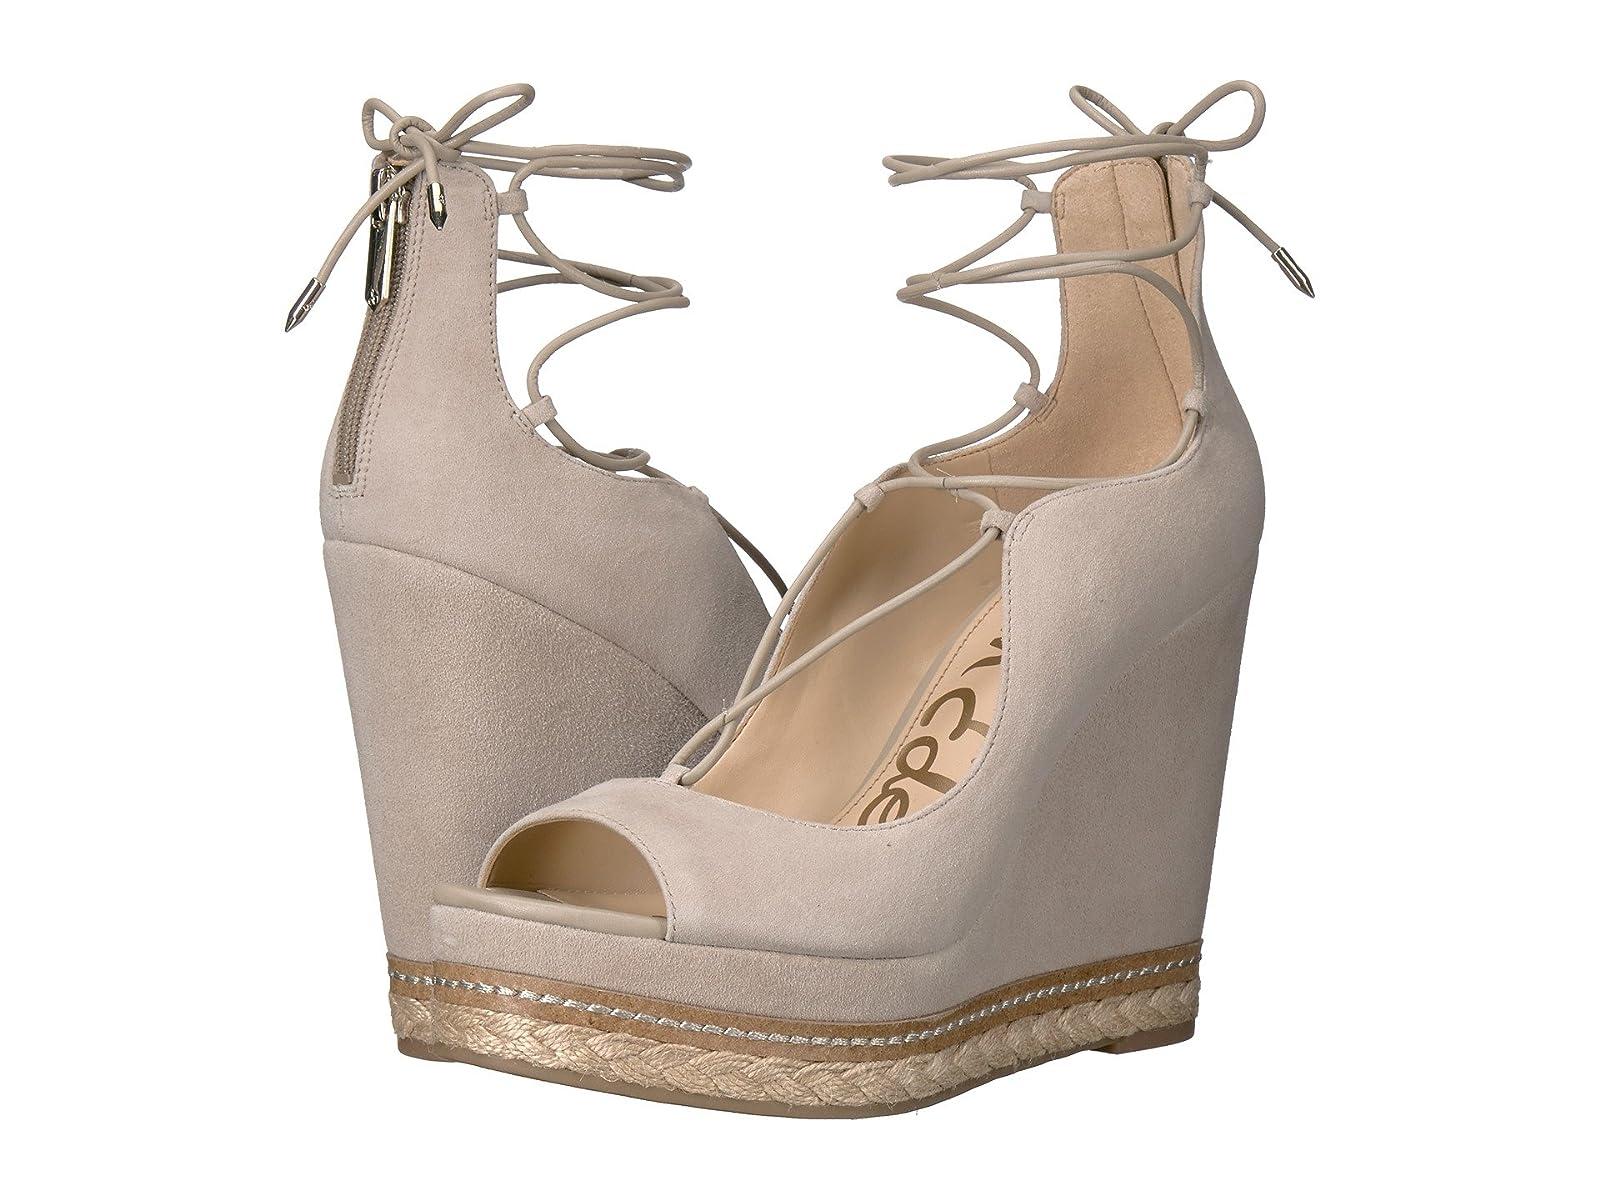 Sam Edelman HarrietCheap and distinctive eye-catching shoes